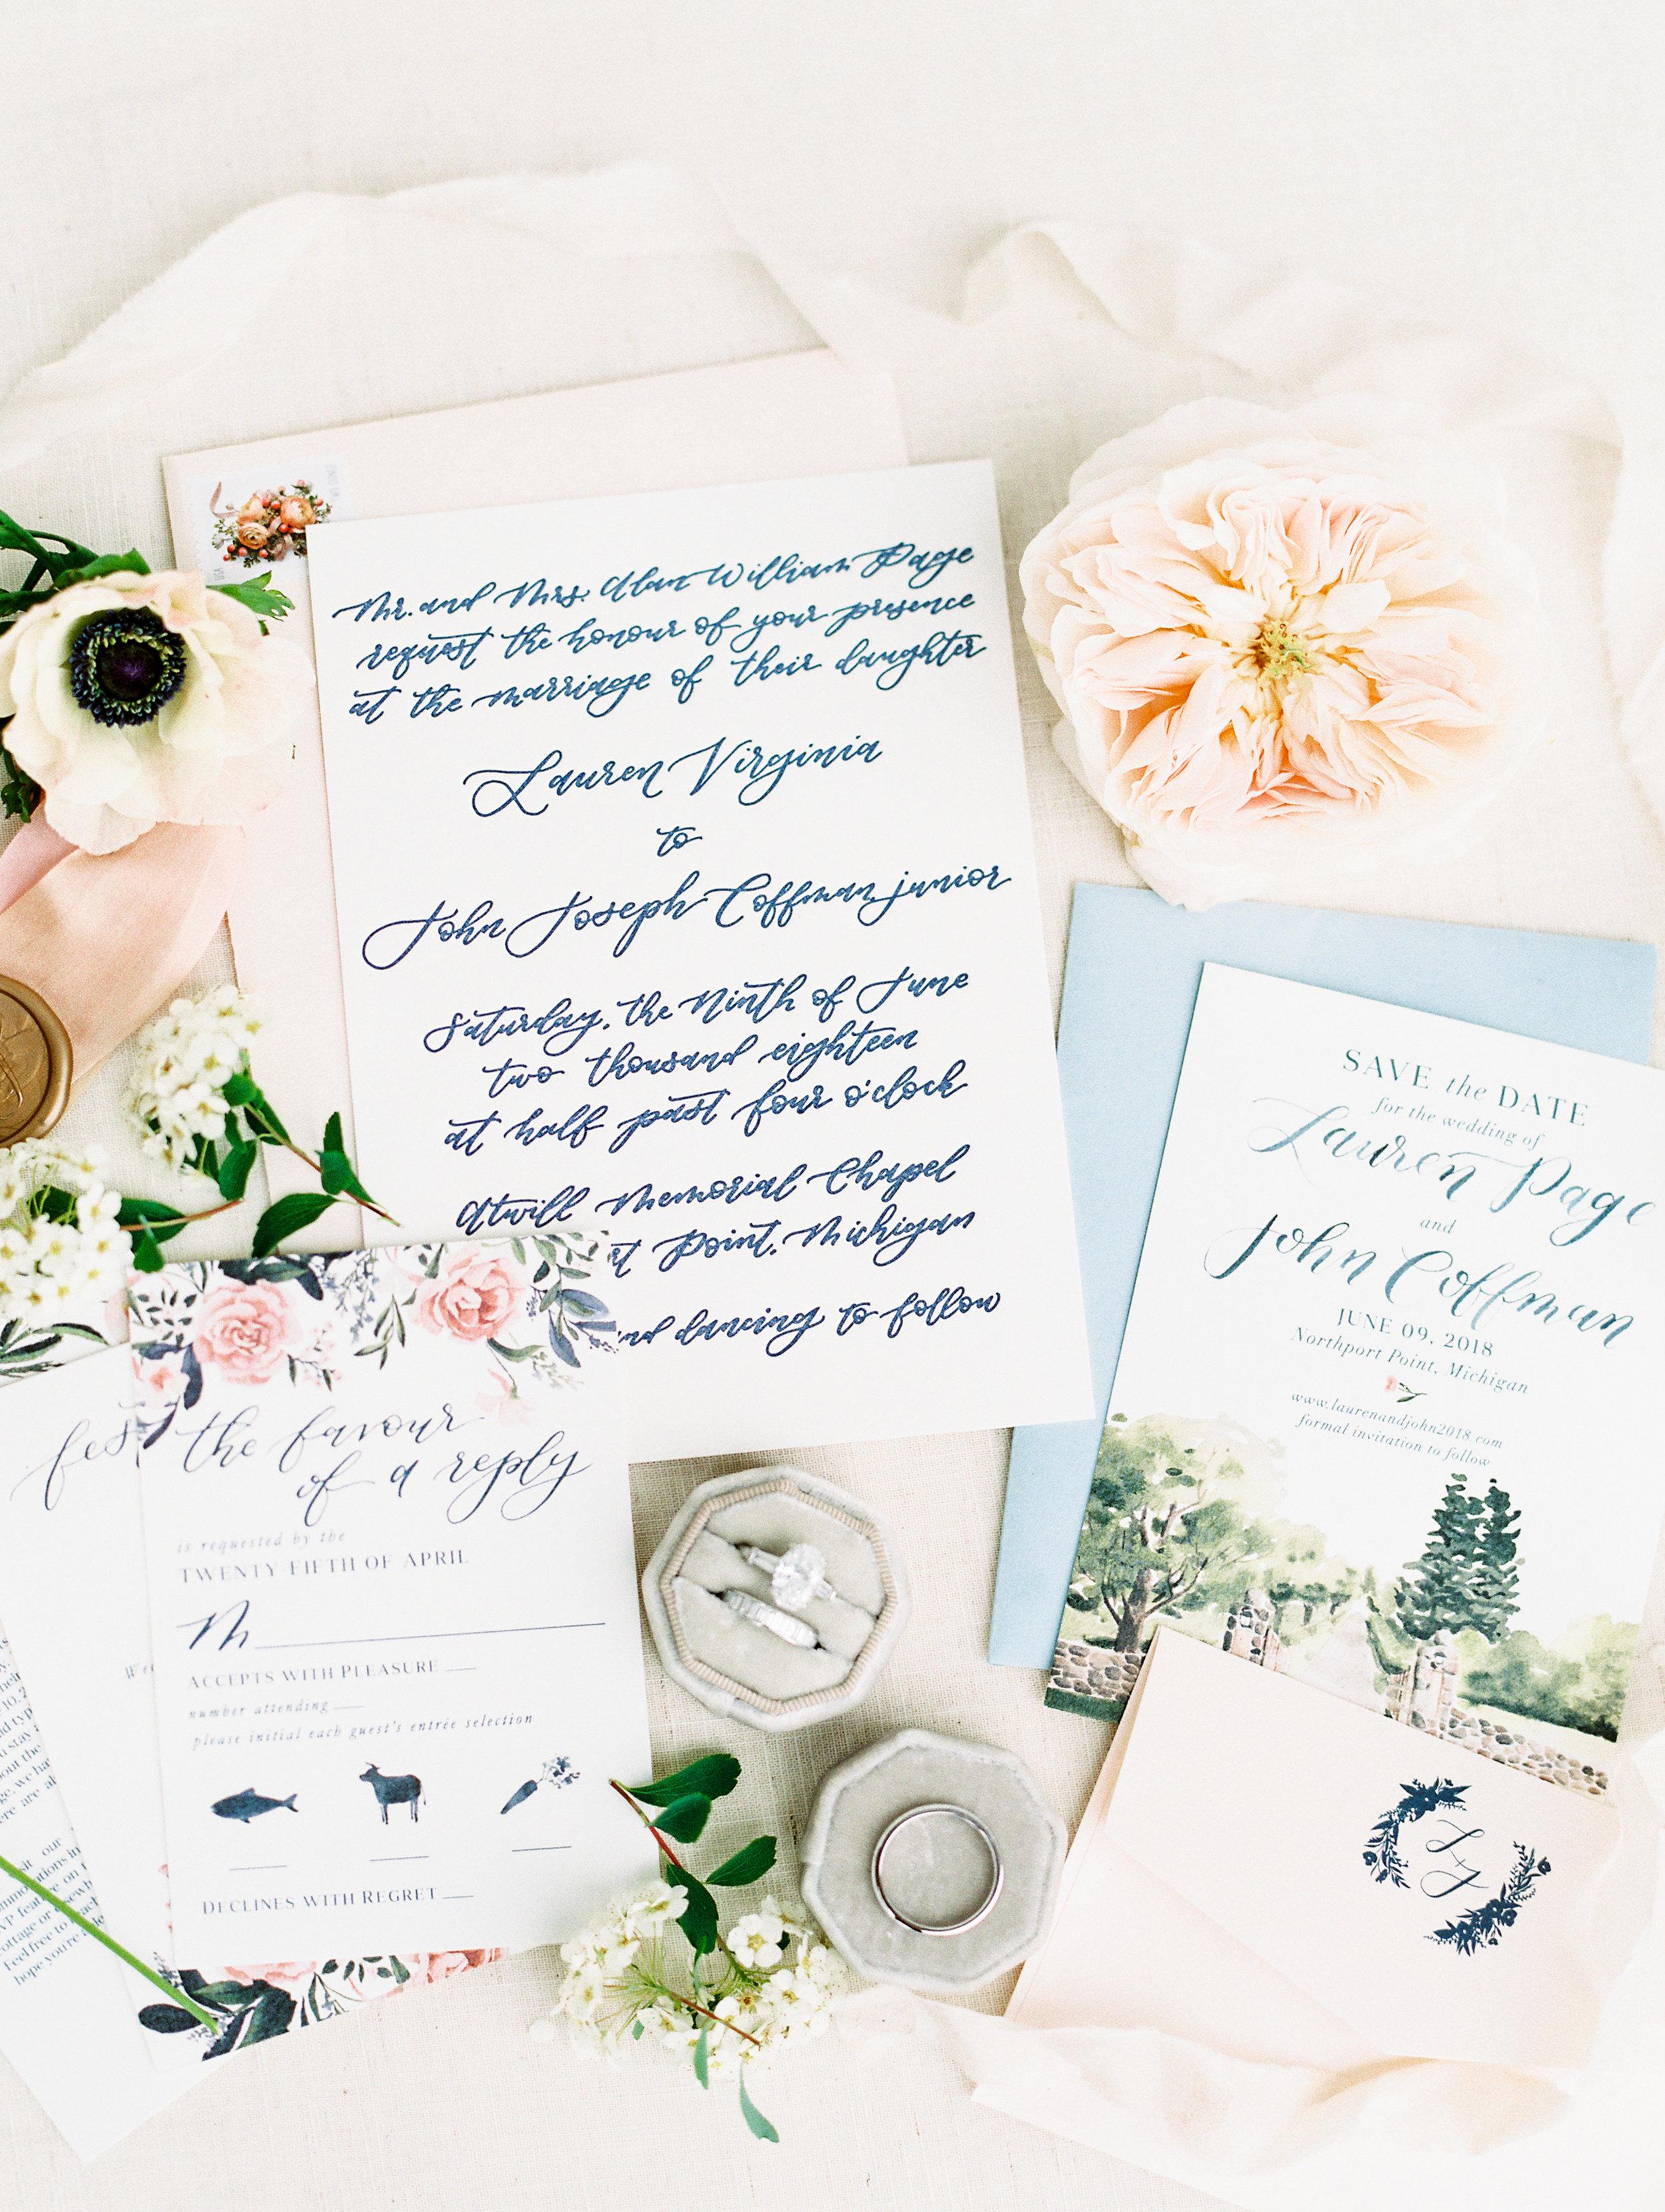 Coffman+Wedding+Details-52.jpg